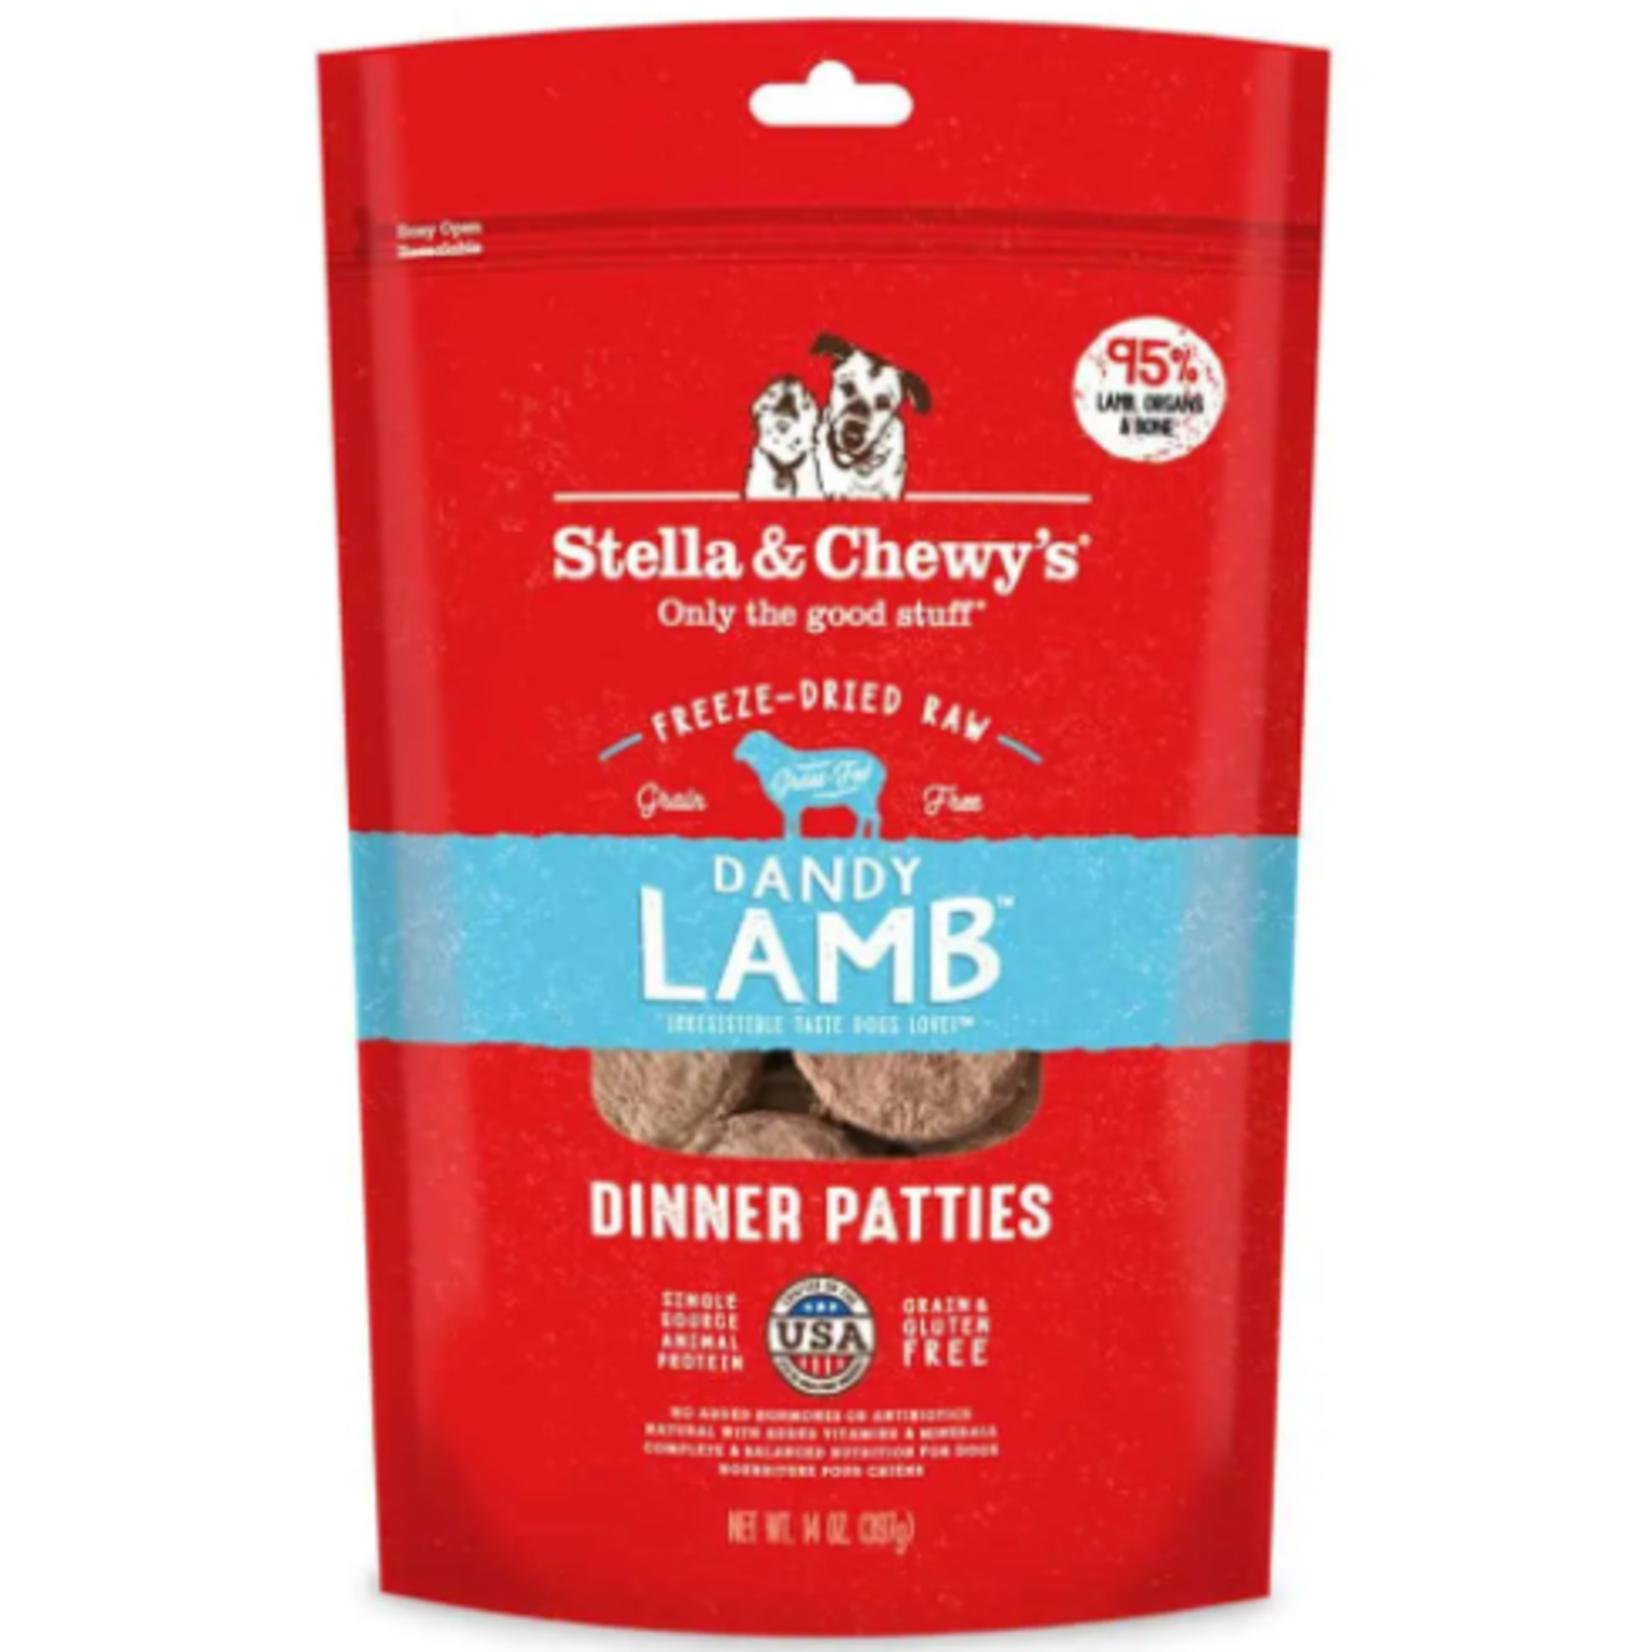 Stella & Chewy s Freeze Dry RAW - Dandy Lamb Dinner Patties - 5.5 oz